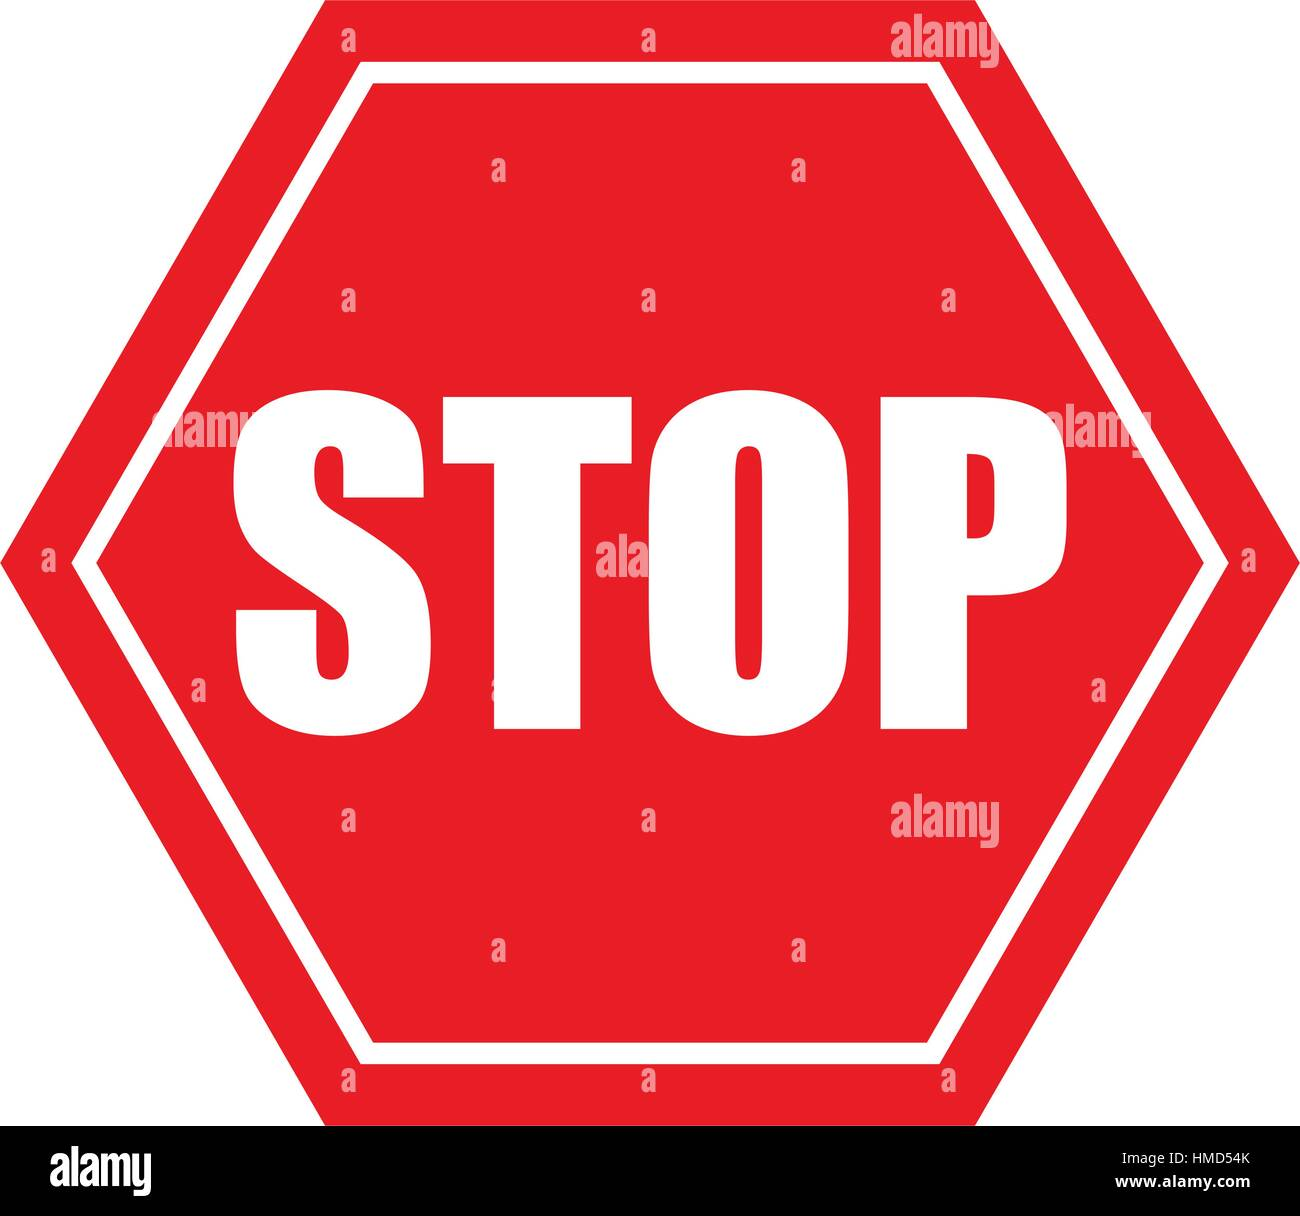 stop danger precaution sign traffic - Stock Image